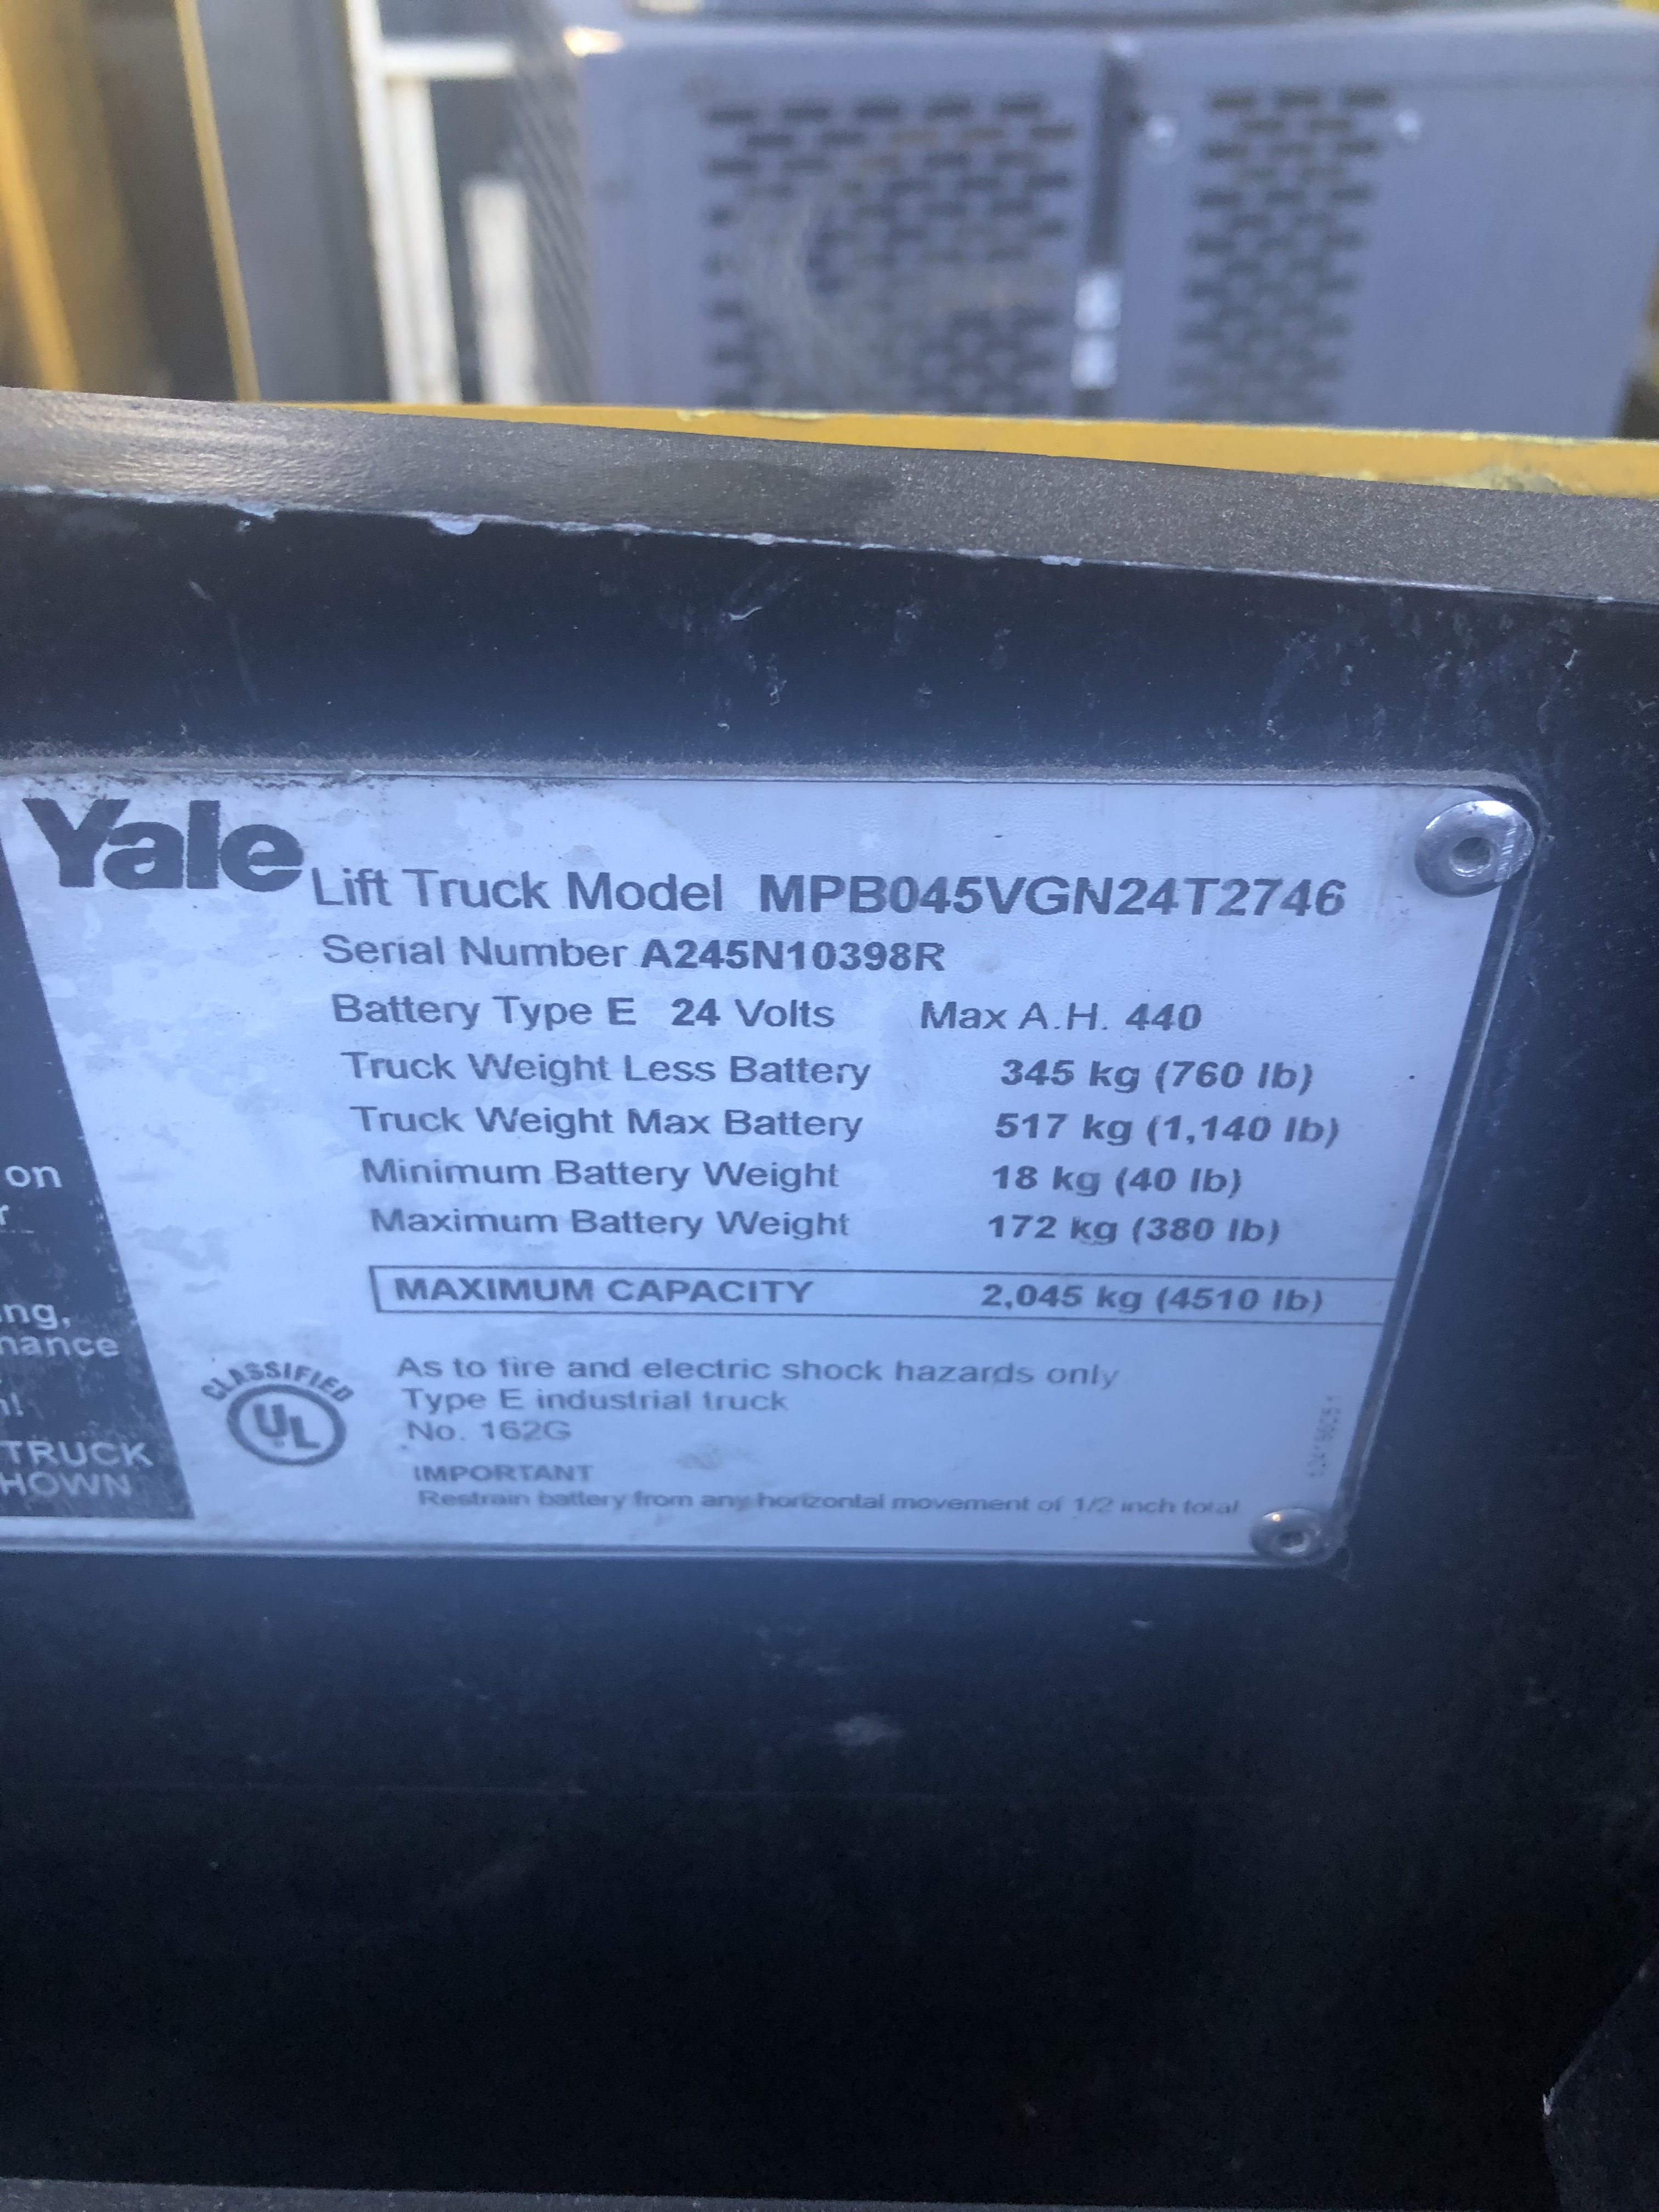 Yale MPB045